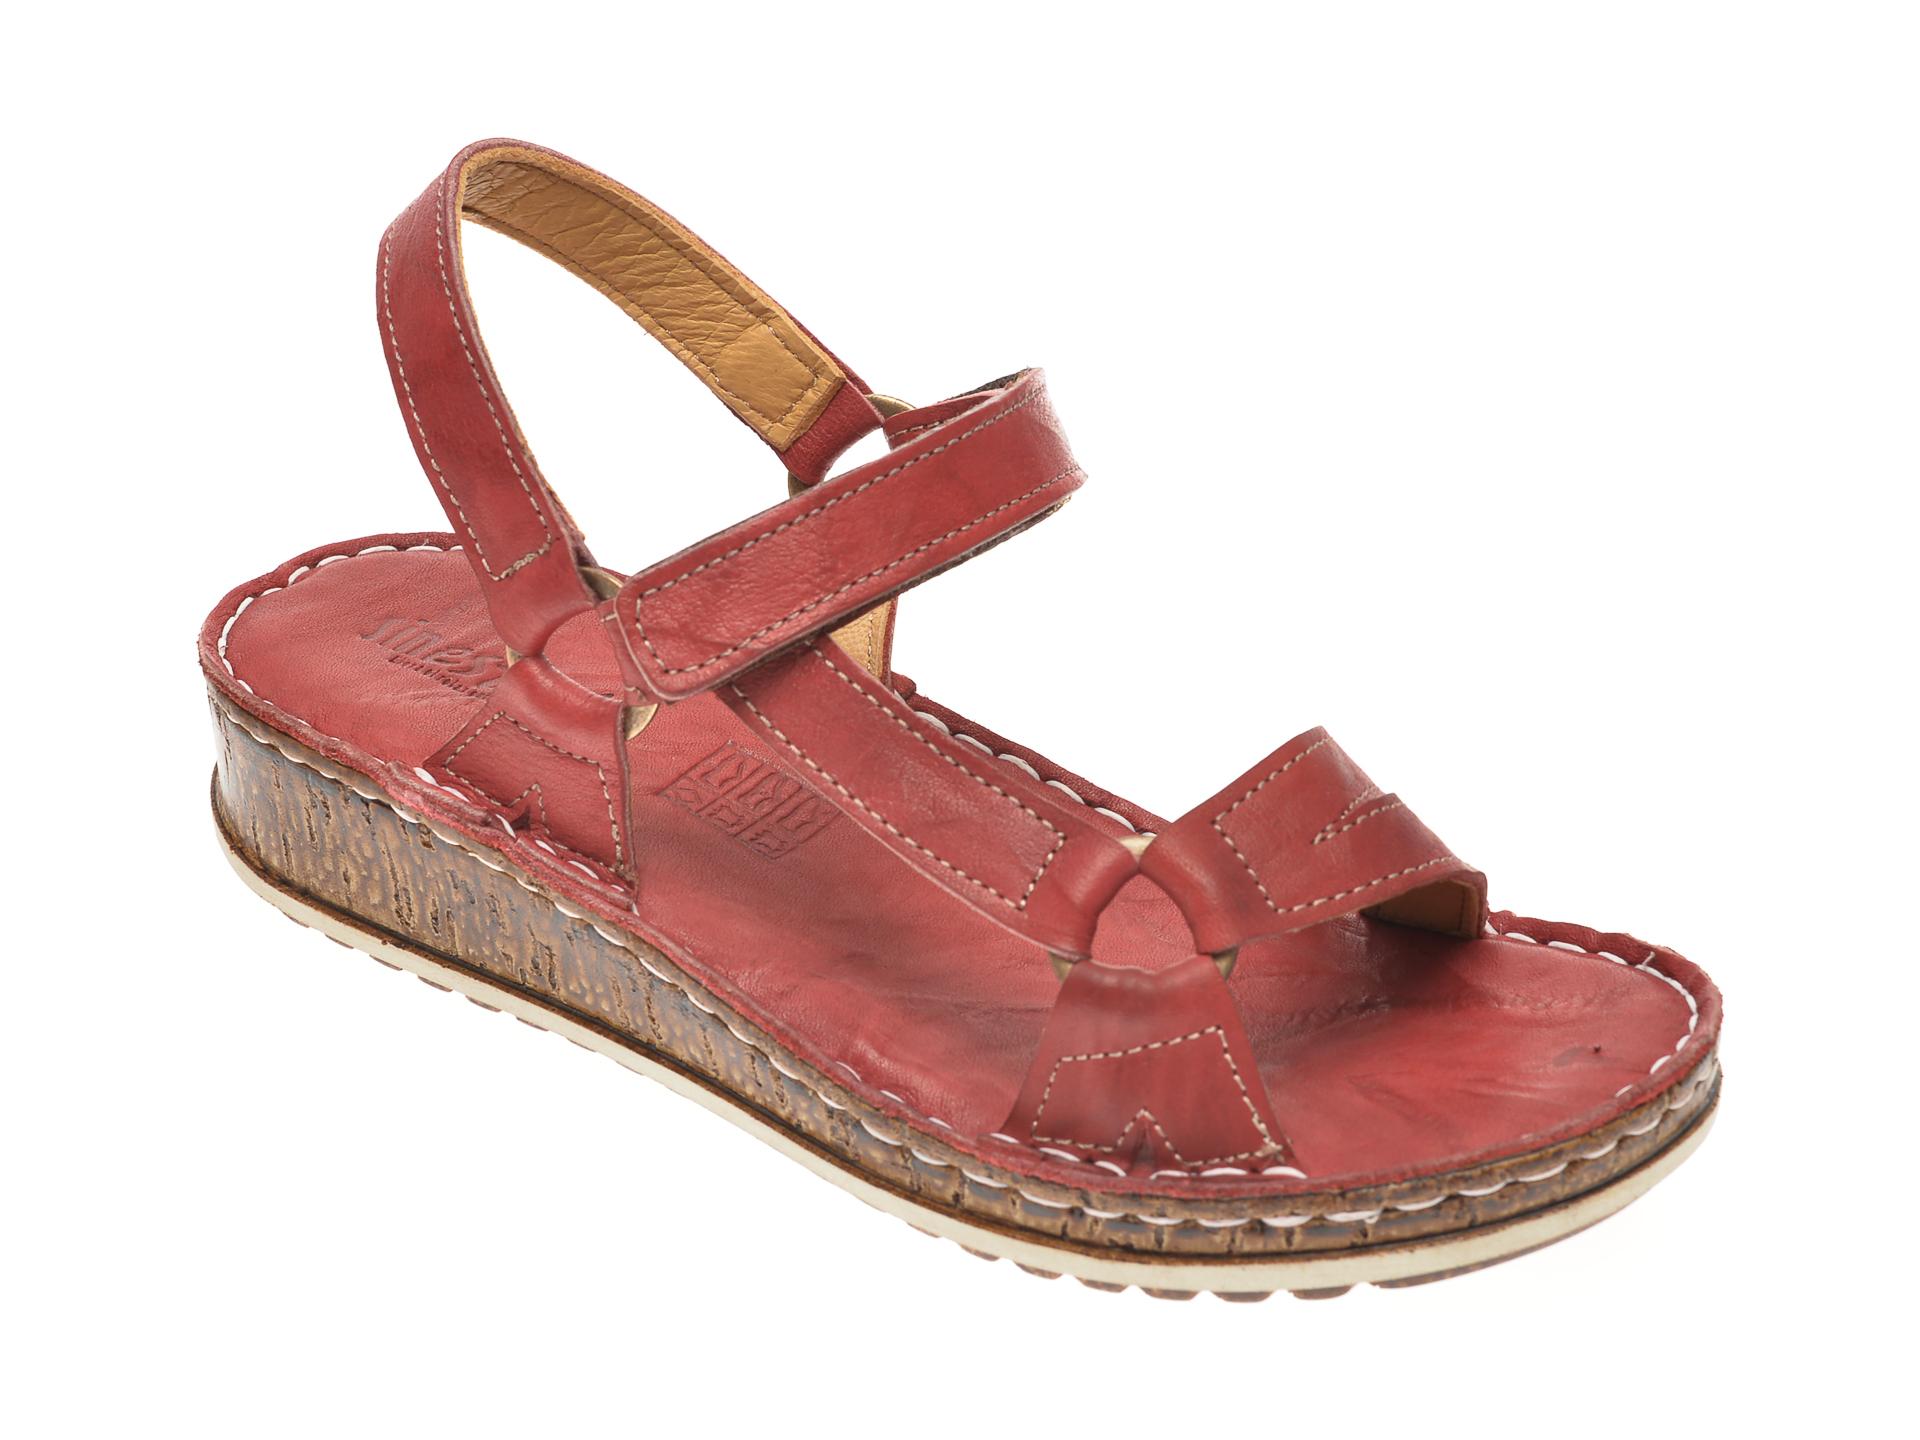 Sandale SINESTRESS visiniu, 1326, din piele naturala